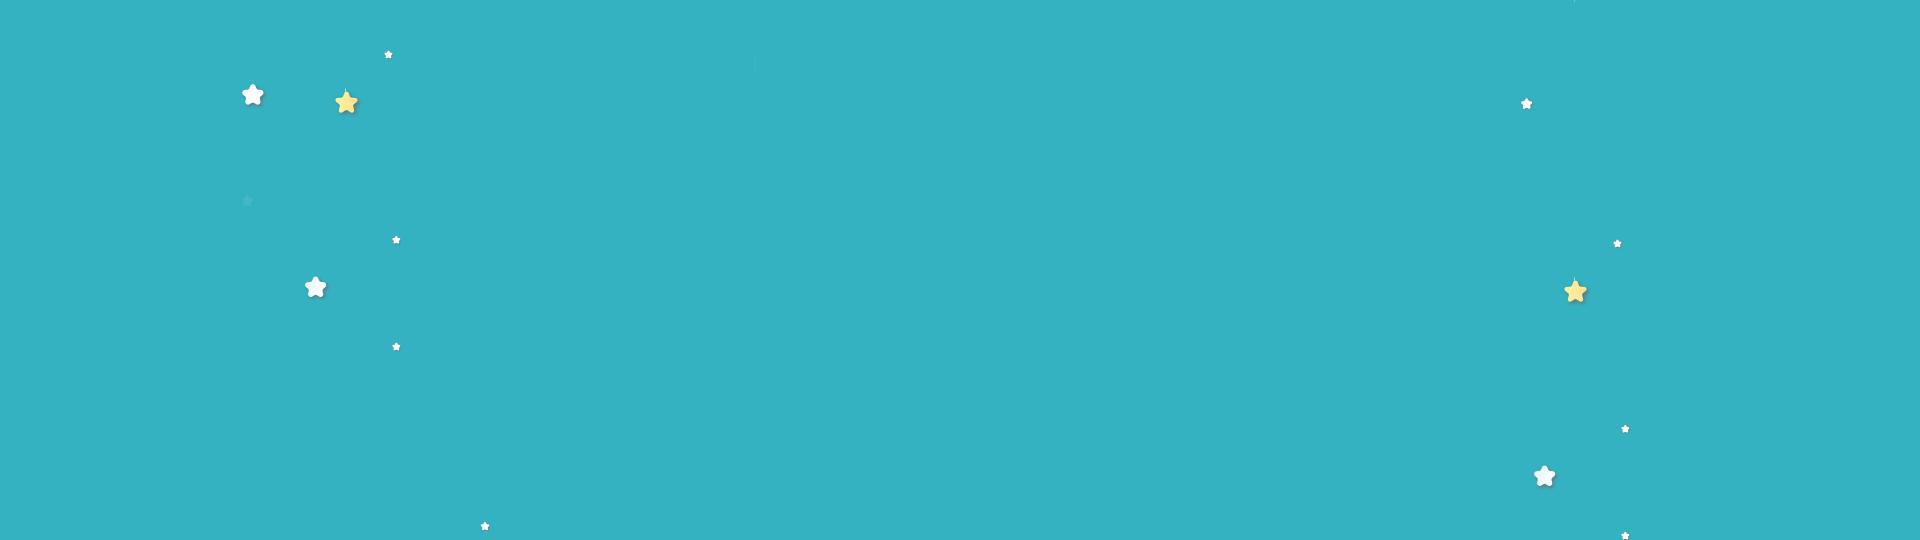 CATEGORY-TEMTUK-PRIMAALTINFIRSATLARKURUSLU-13-01